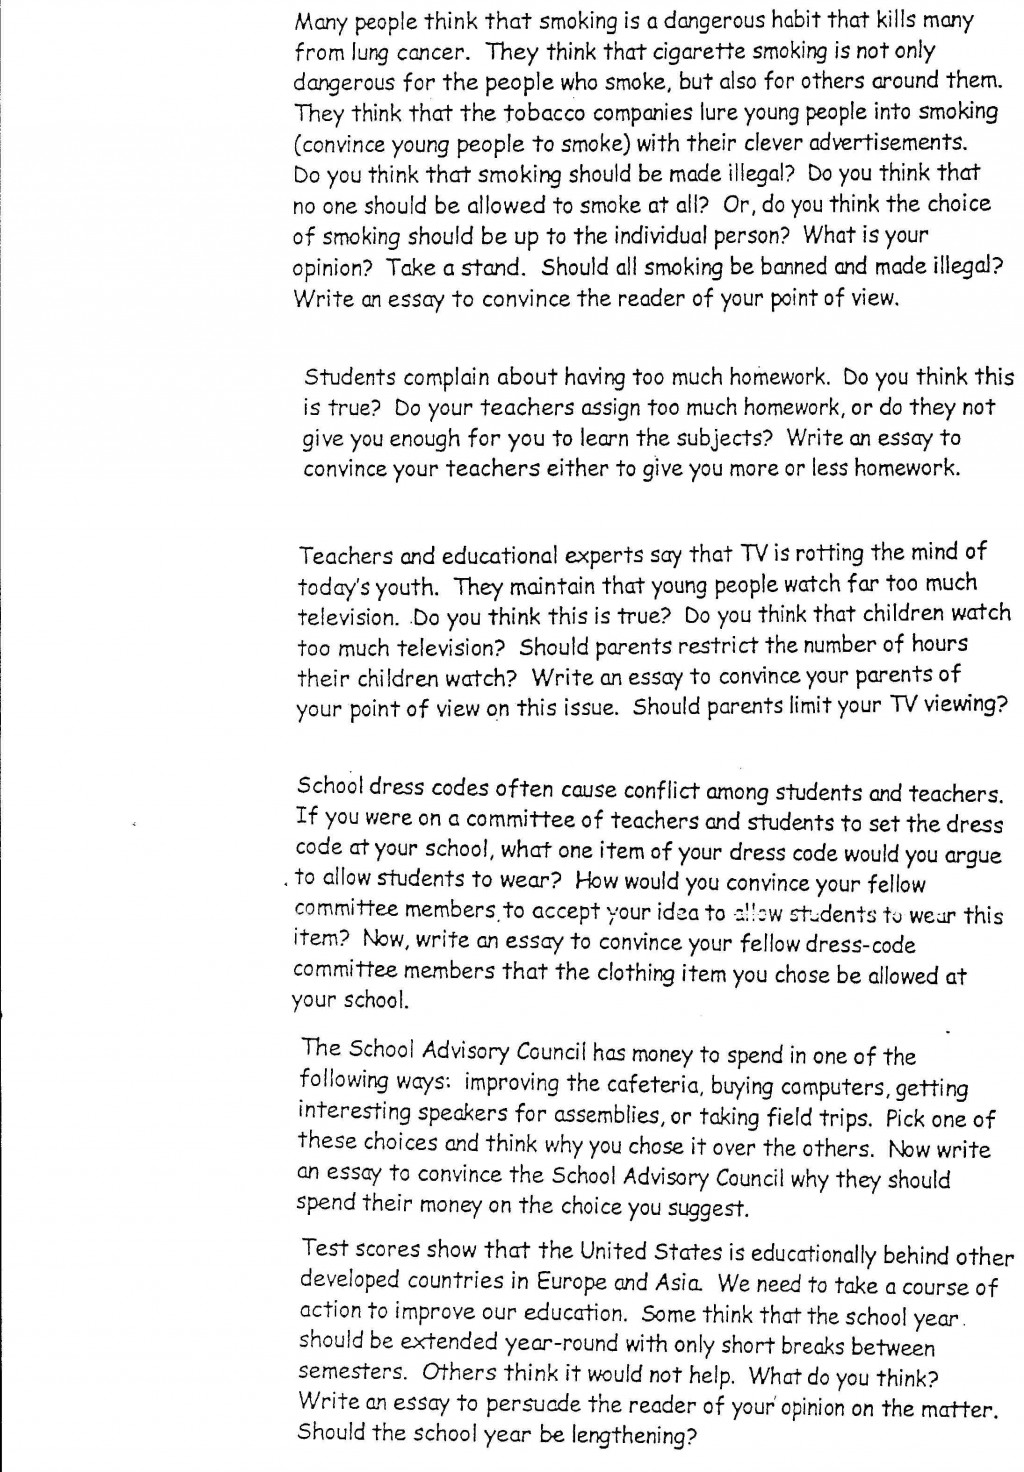 020 Interesting Essay Topics Argumentative Persuasive L Amazing For Grade 7 9 Pat 7th Large